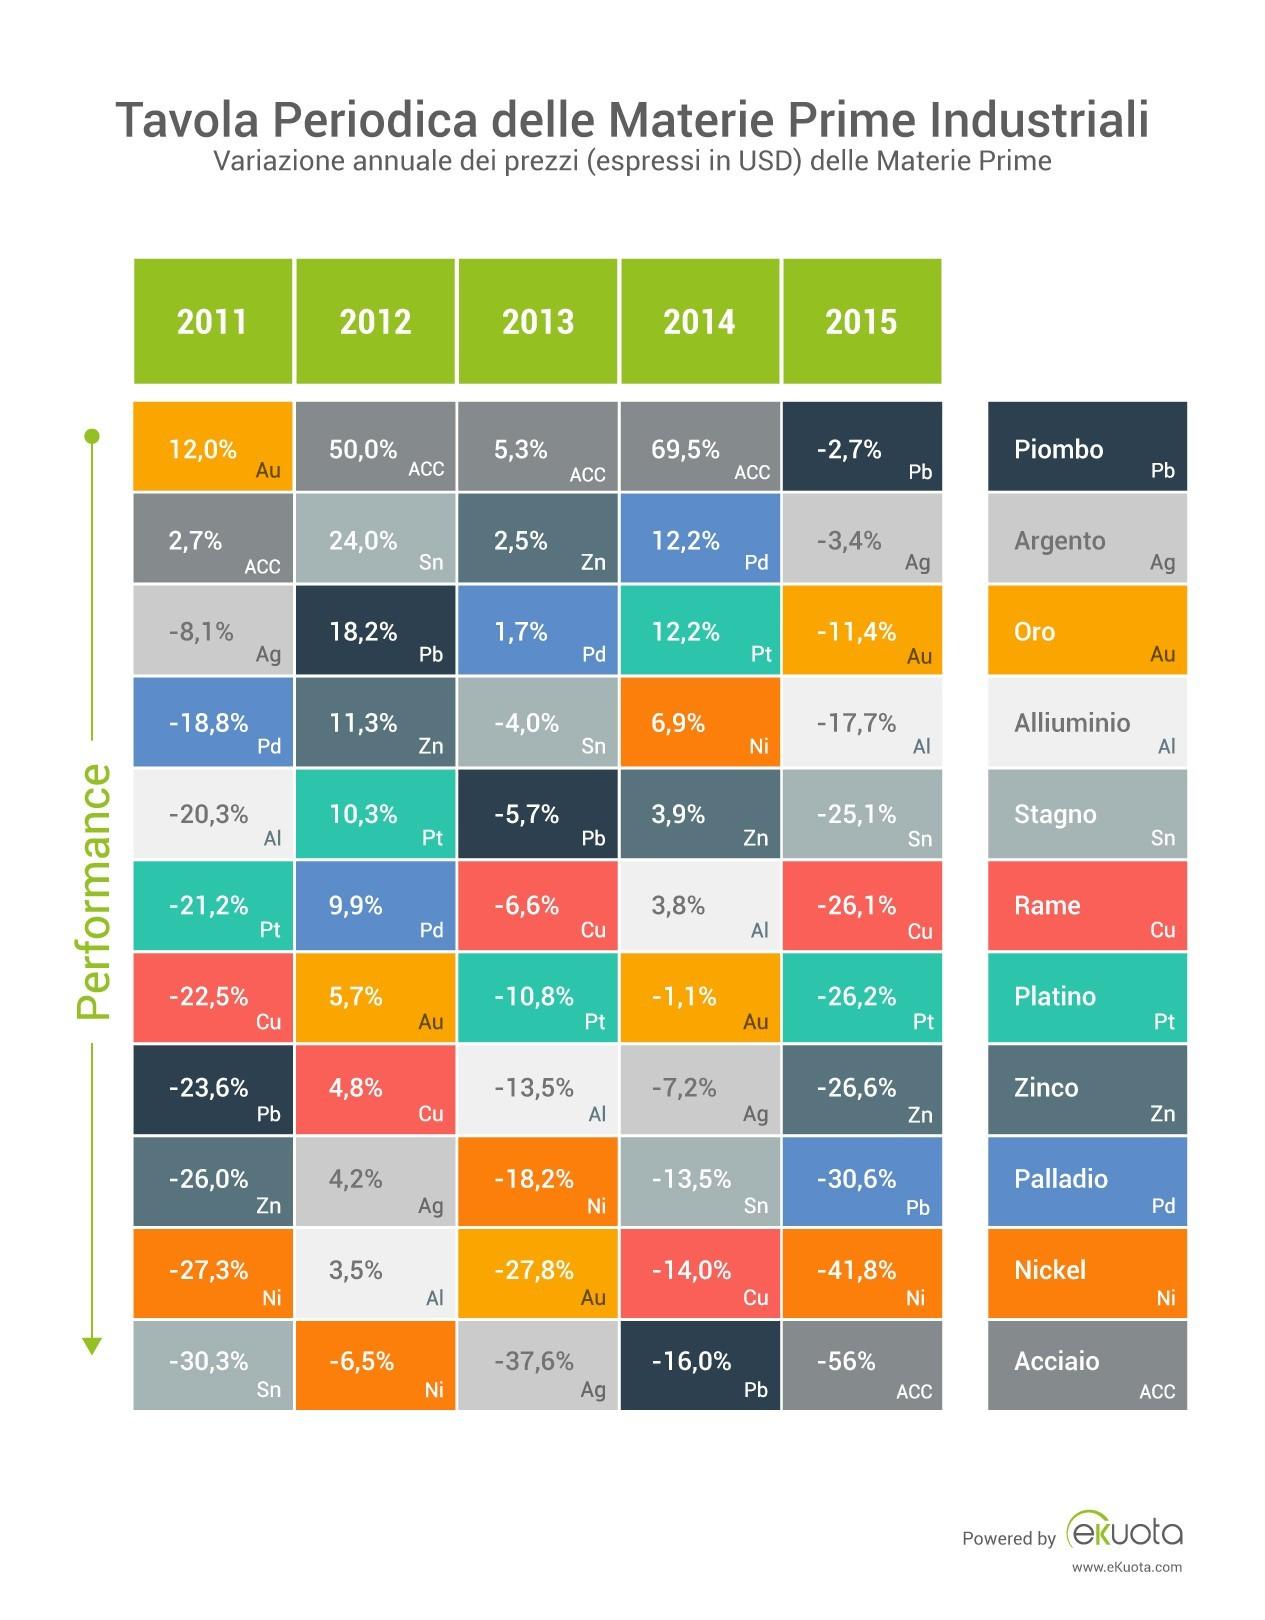 Tavola periodica delle materie prime industriali 2015 ekuota - Tavola periodica dei metalli ...